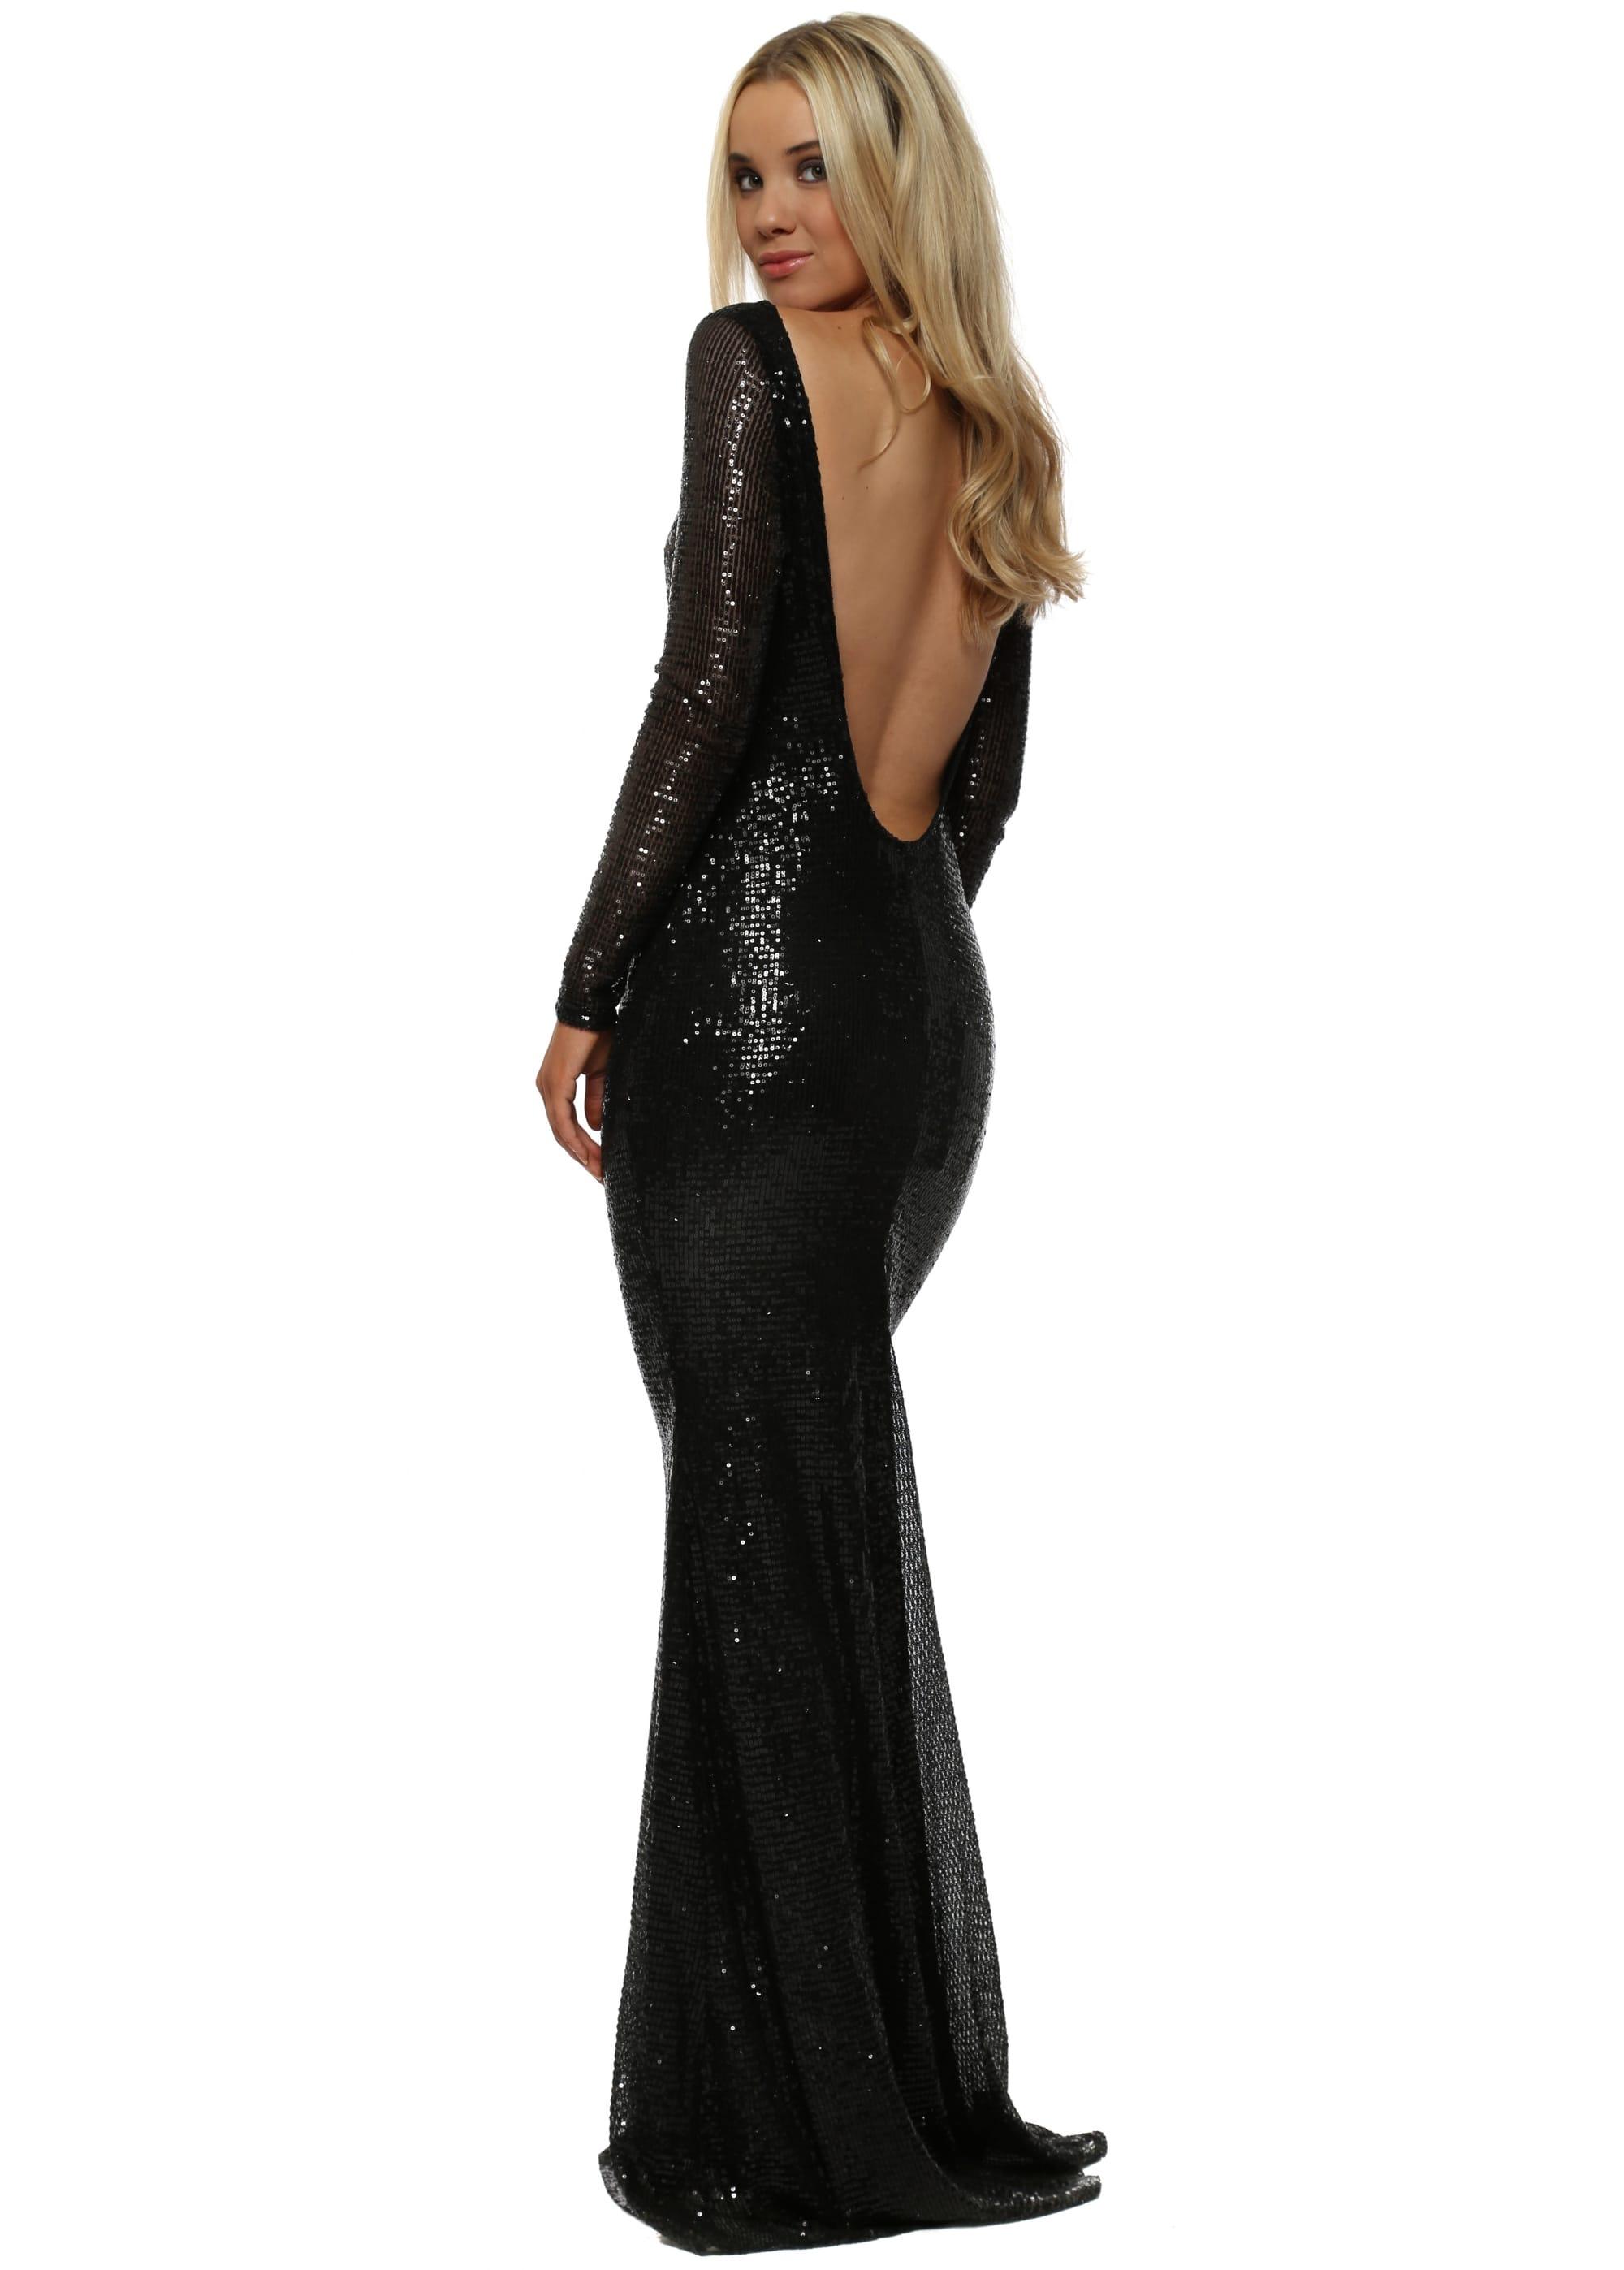 343aa5764e8 Stephanie Pratt Open Back Black Sequin Fishtail Maxi Dress